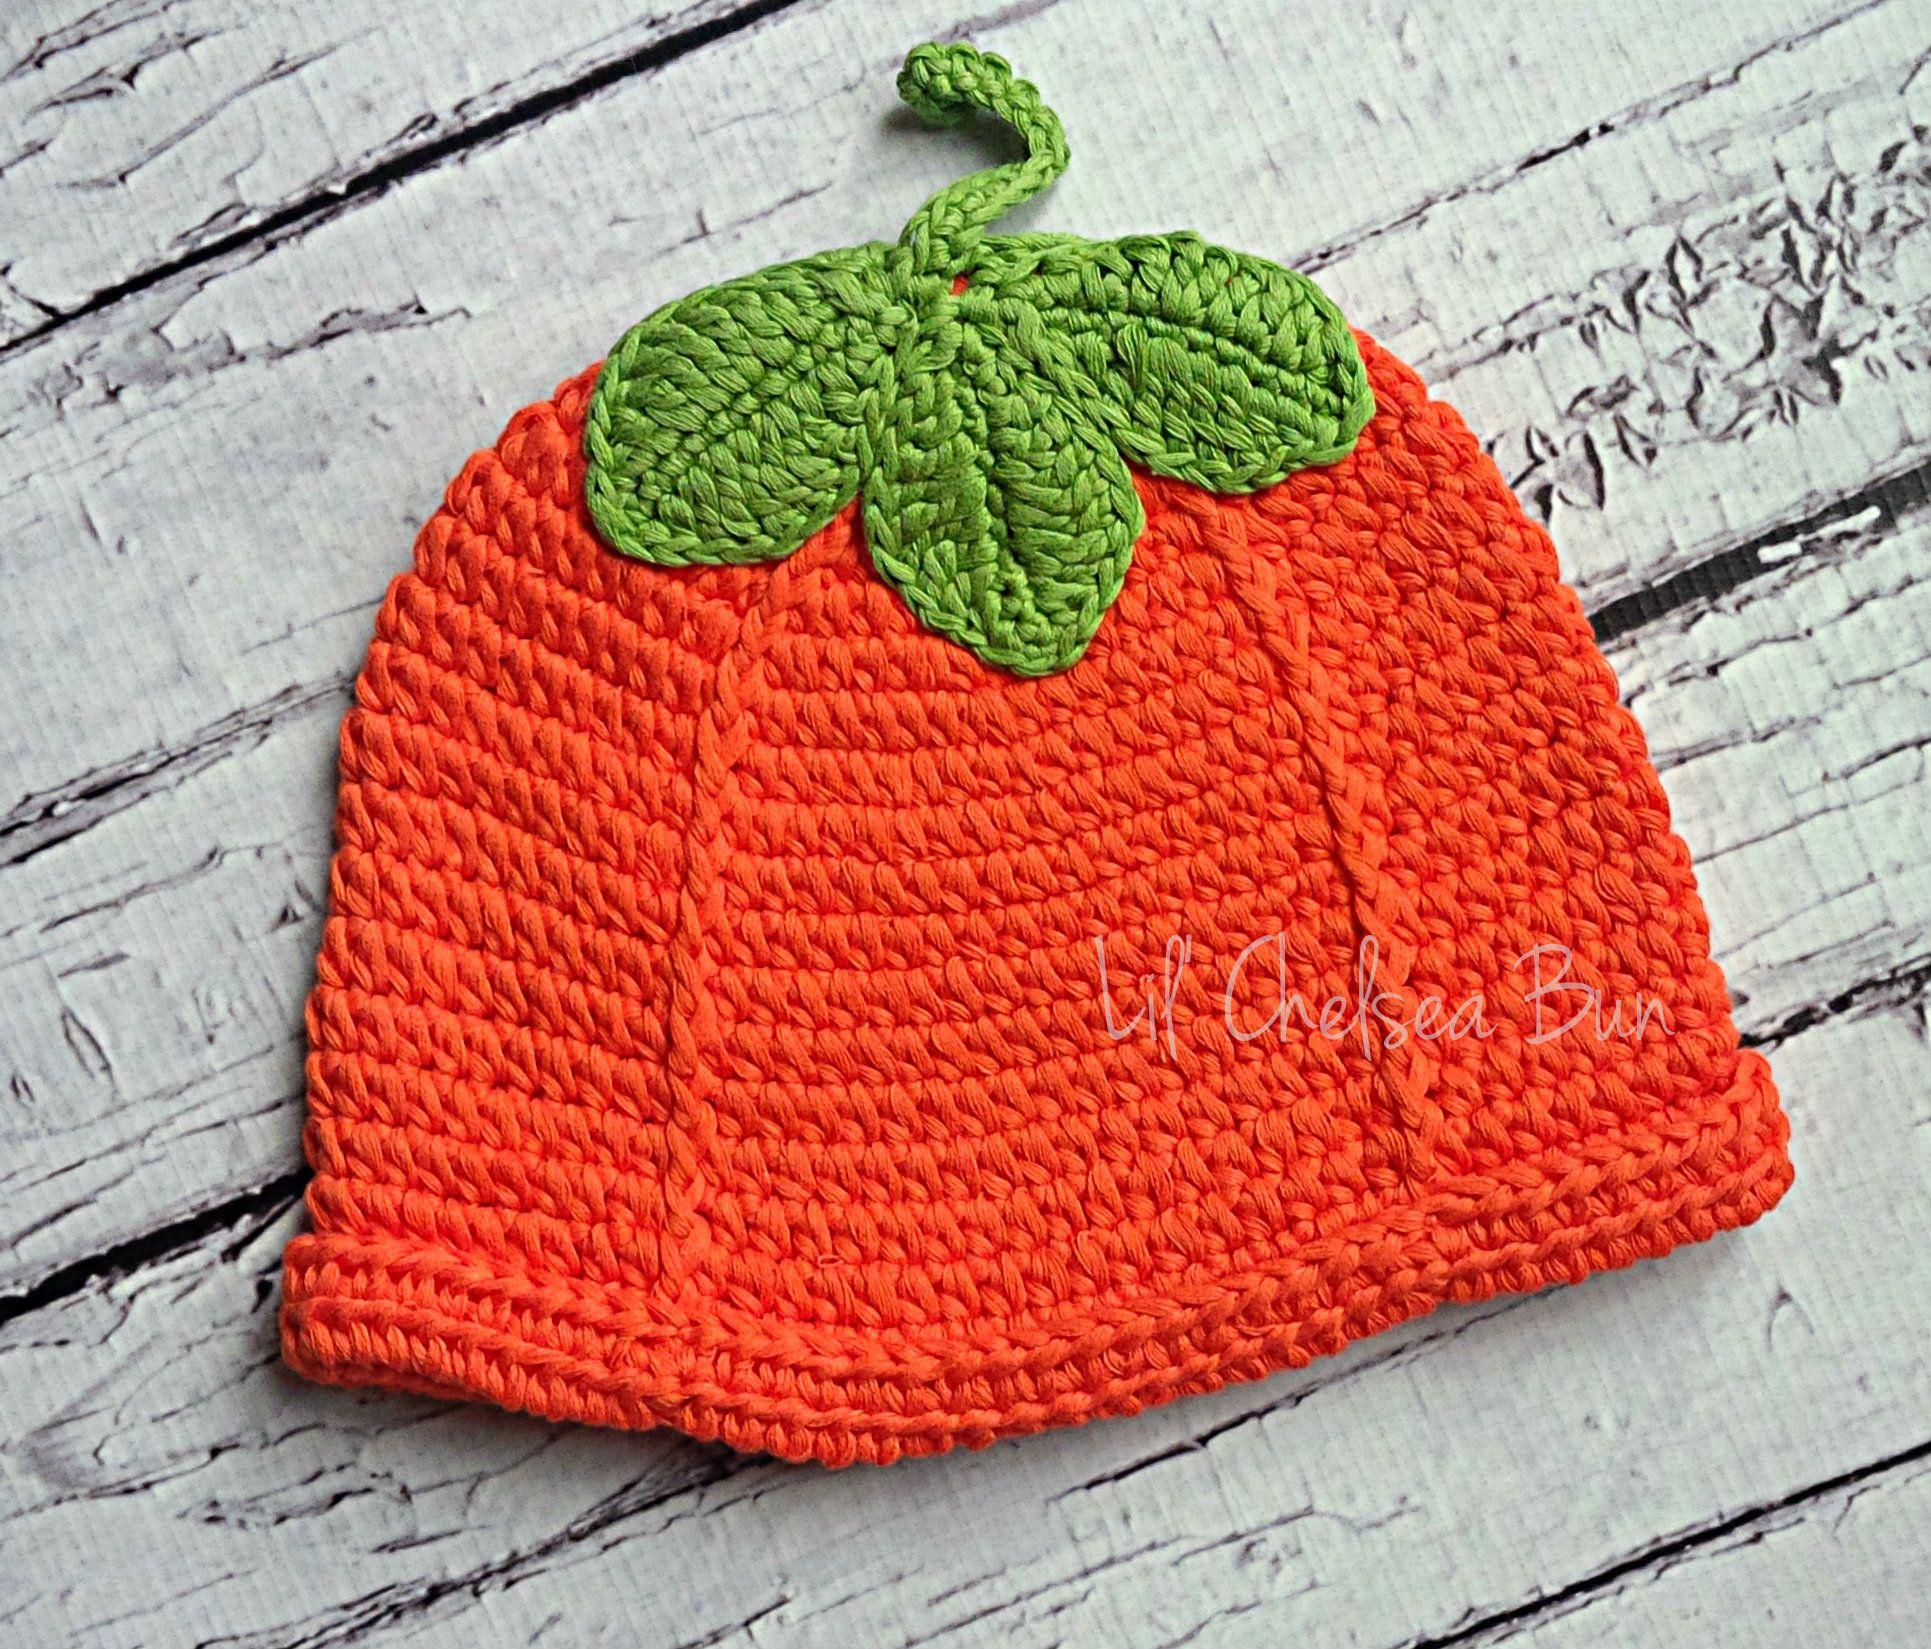 Crocheting Yarn Over : Pumpkin Crochet Hat Yarn over! Pinterest